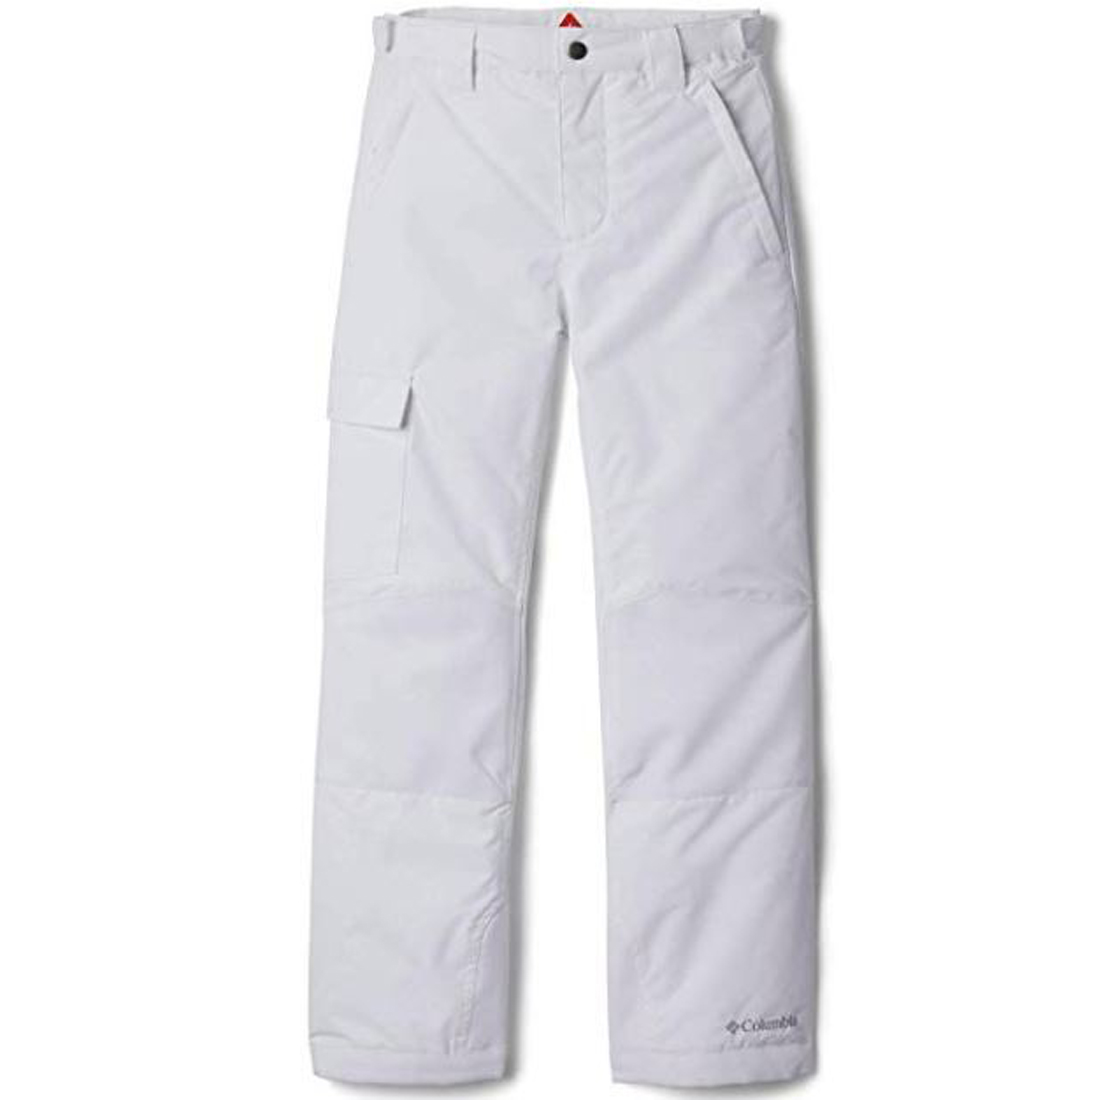 Columbia Youth Size L 14-16 Bugaboo Pant Winter Snowpant Bright Plum Omni-Heat